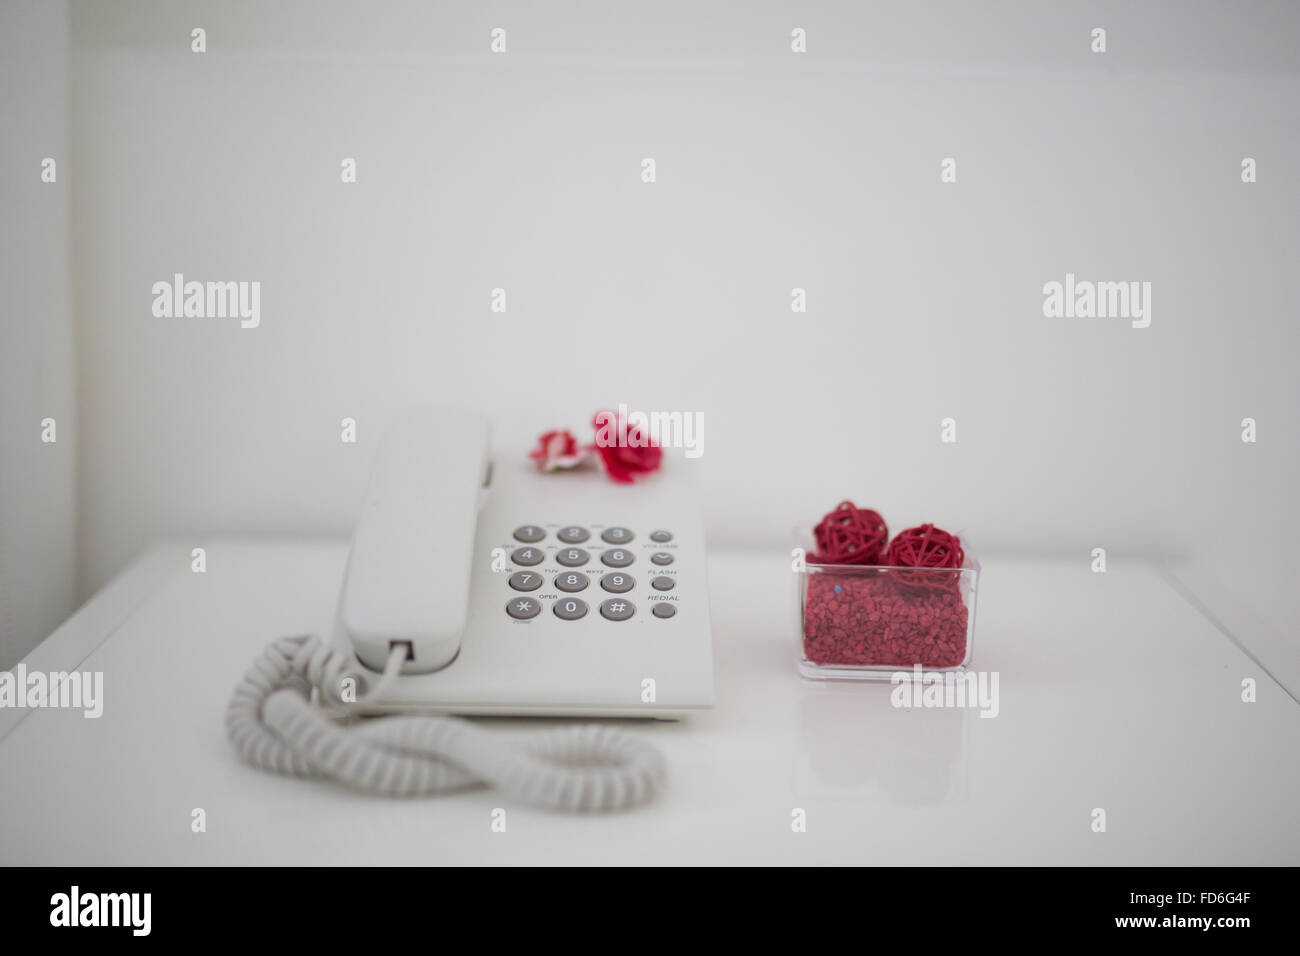 Landline Phone On A Table - Stock Image